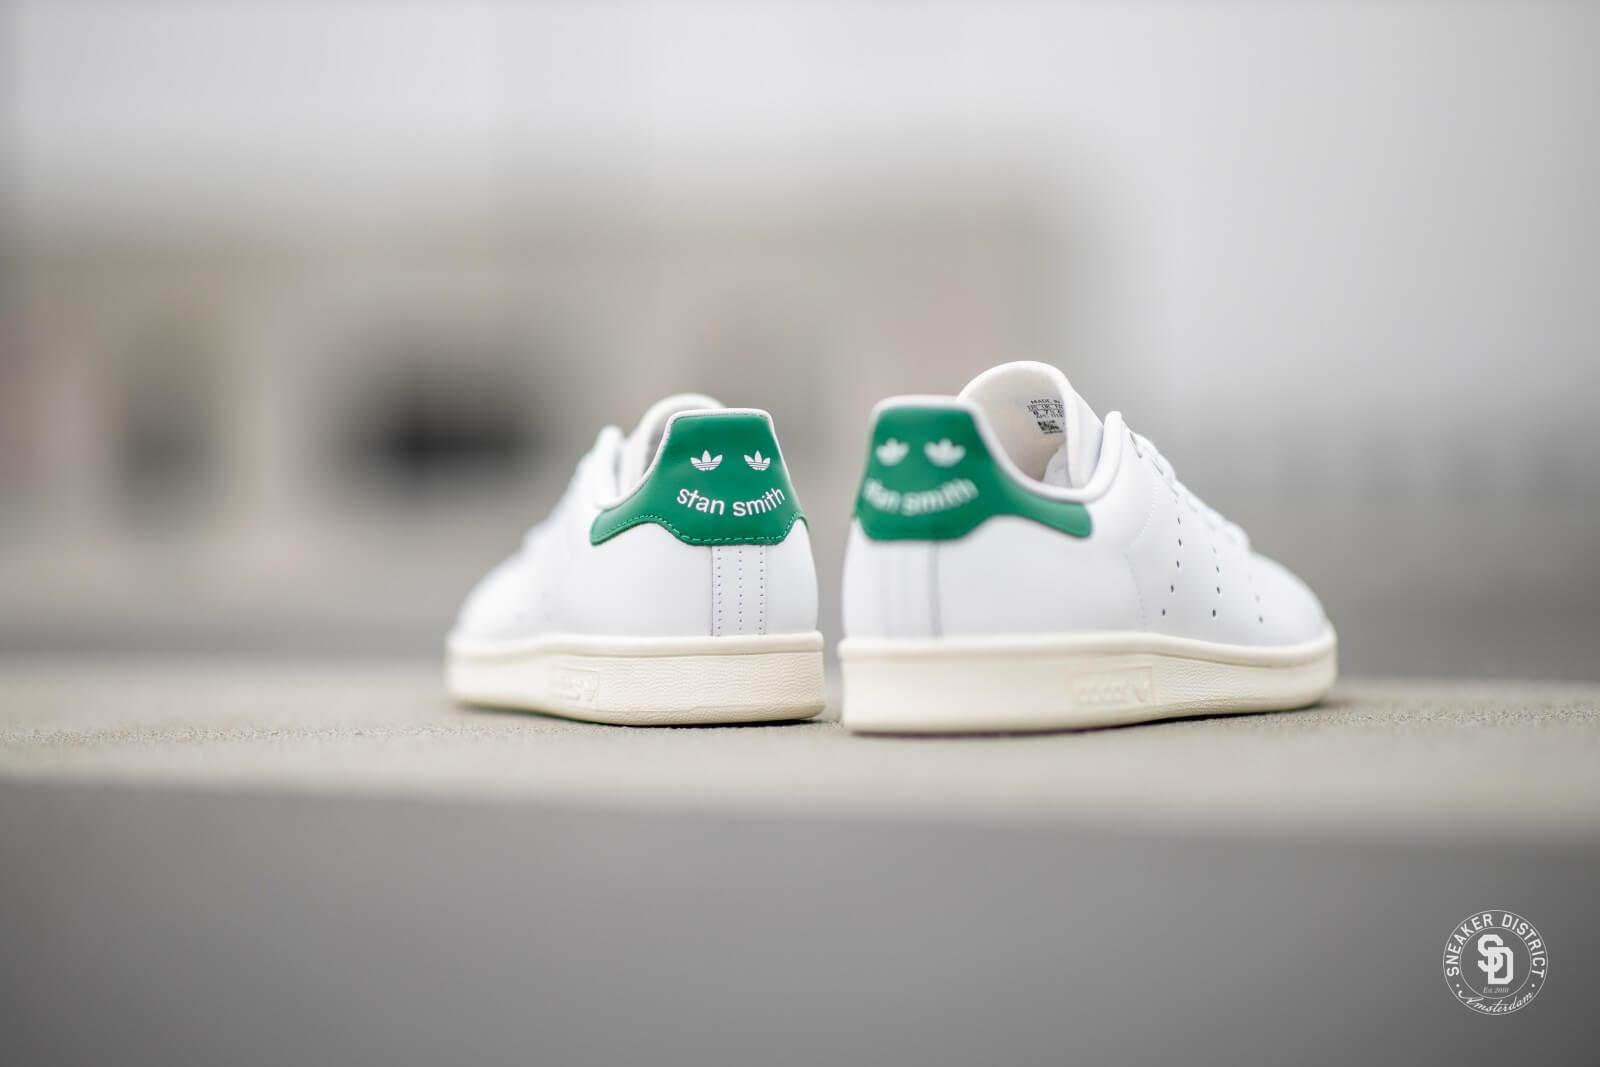 Adidas Stan Smith Footwear White/Off